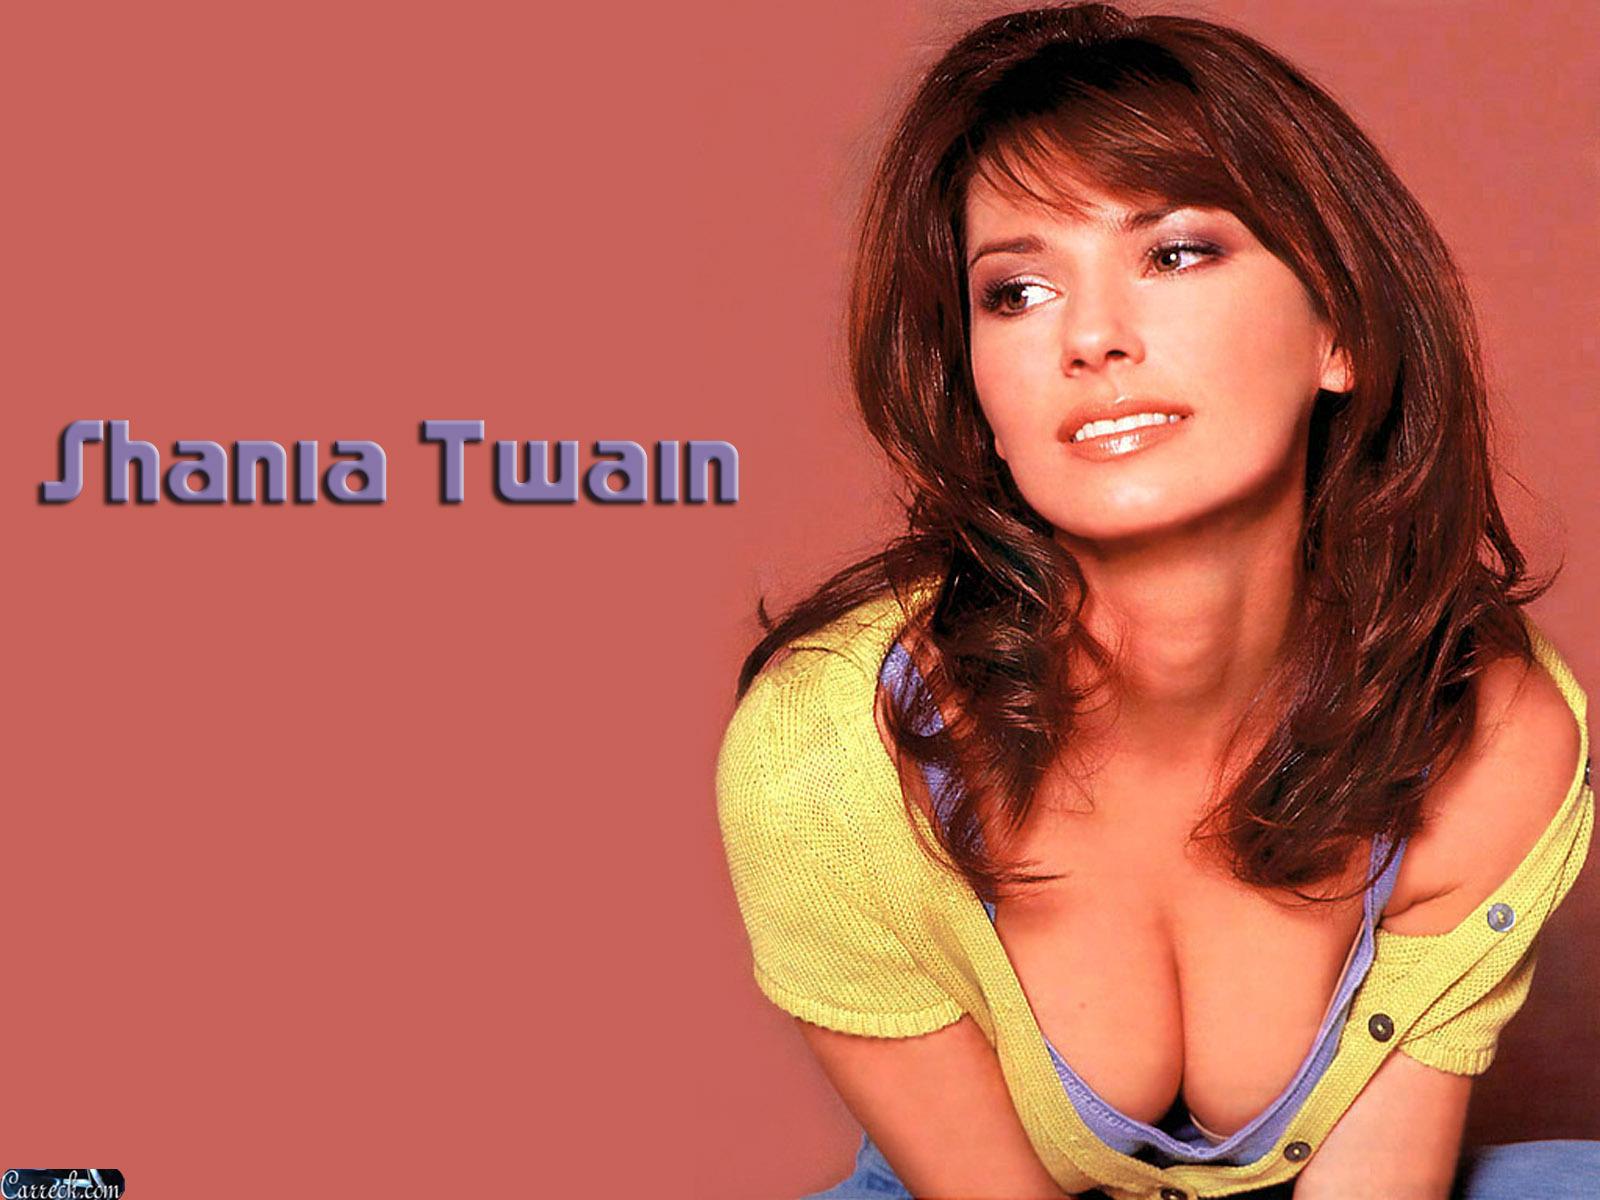 Uma Name Wallpaper 3d Shania Twain Wallpaper 1600x1200 64927